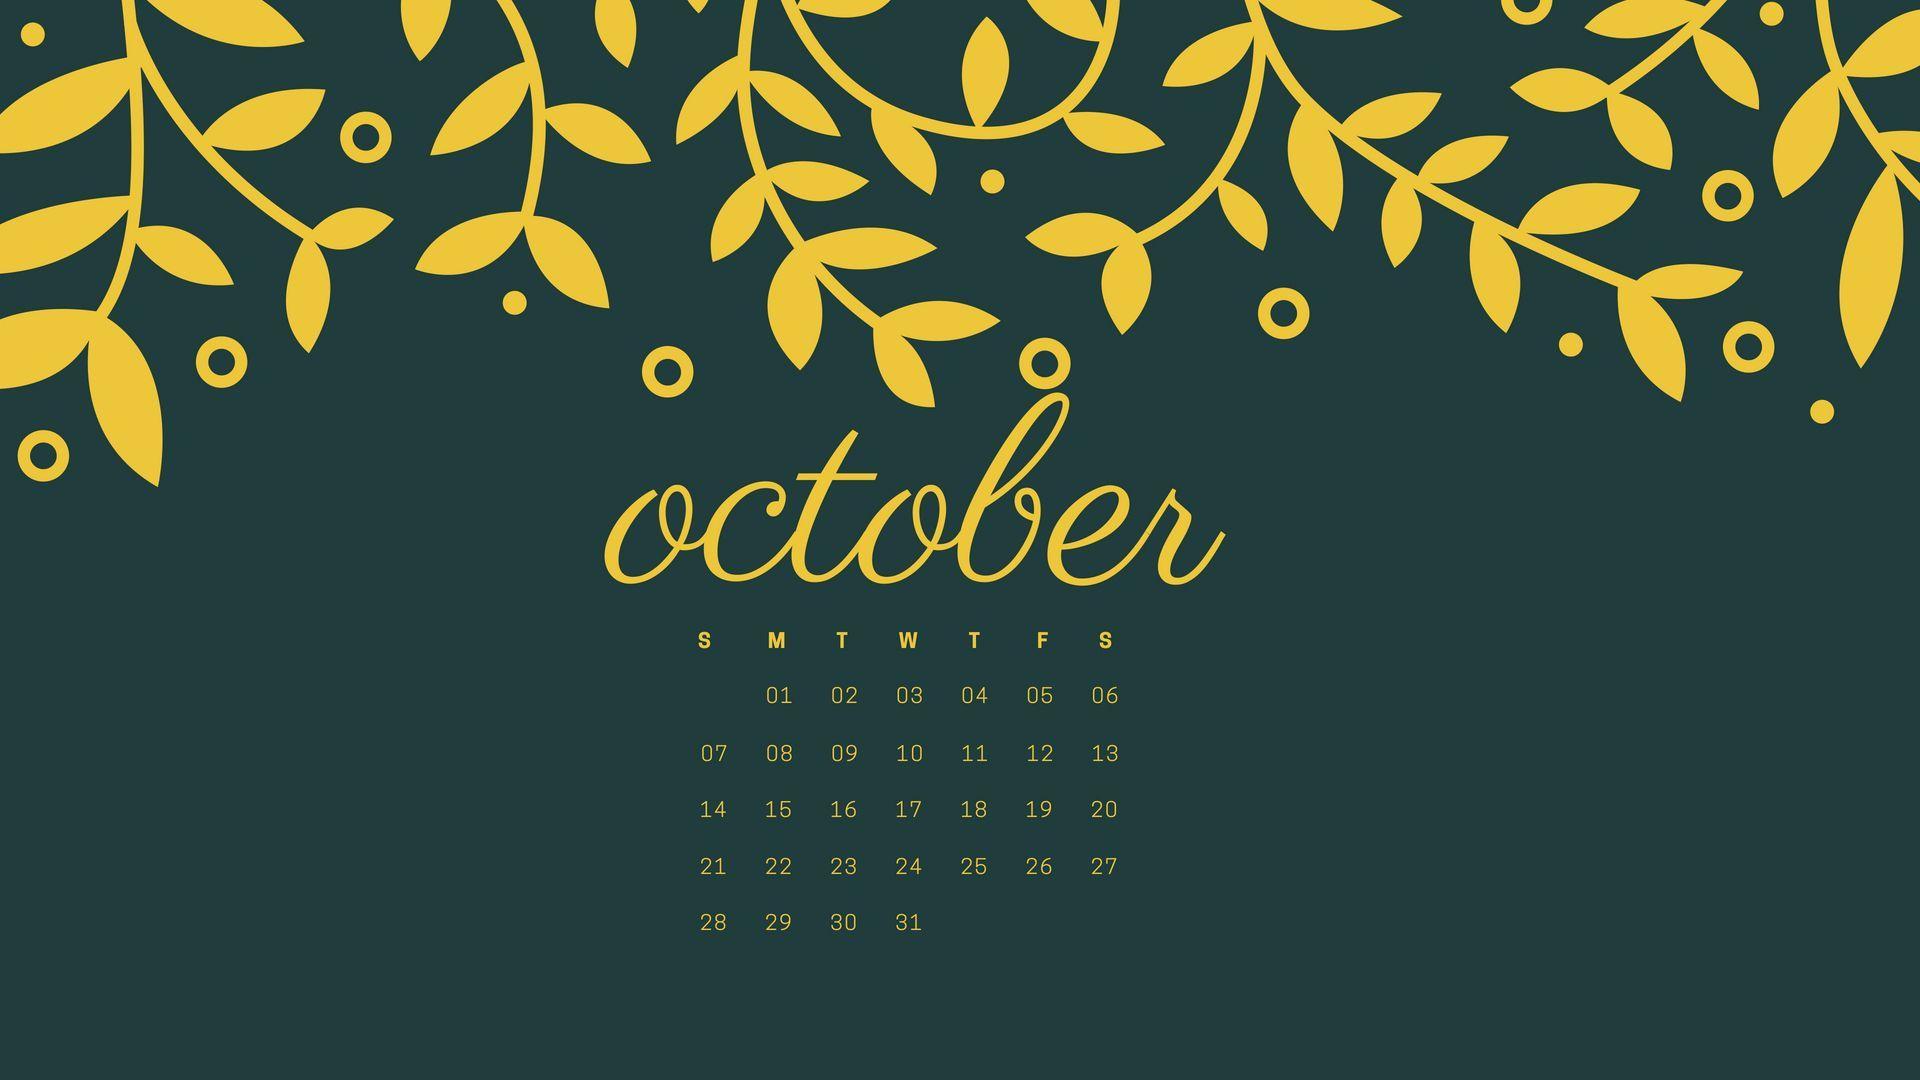 Free October 2018 Calendar Hd Desktop Wallpapers October Calendar Wallpaper October Wallpaper Calendar Wallpaper